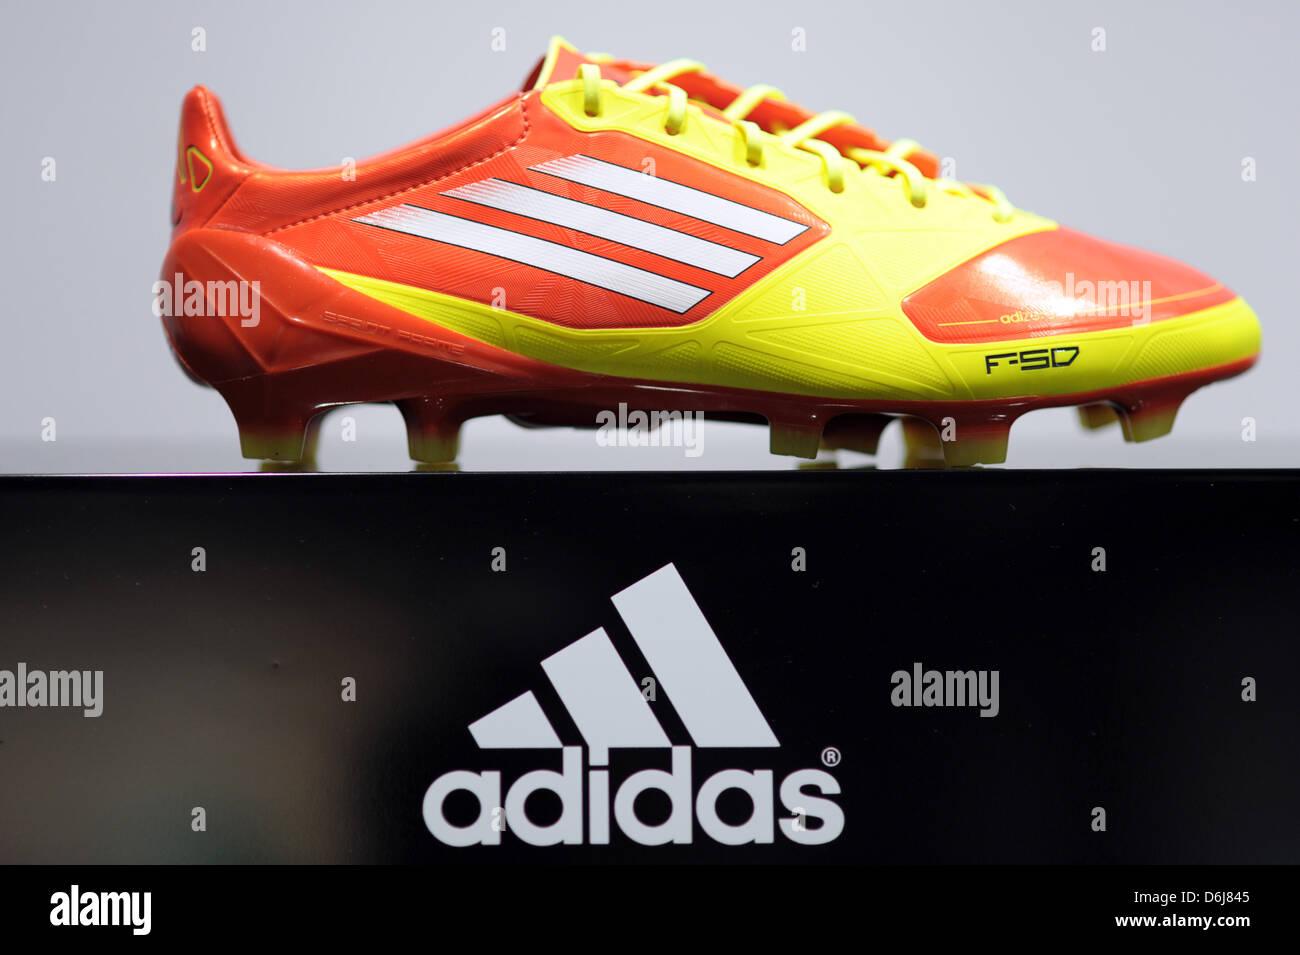 Adidas F50 Stockfotos & Adidas F50 Bilder Alamy